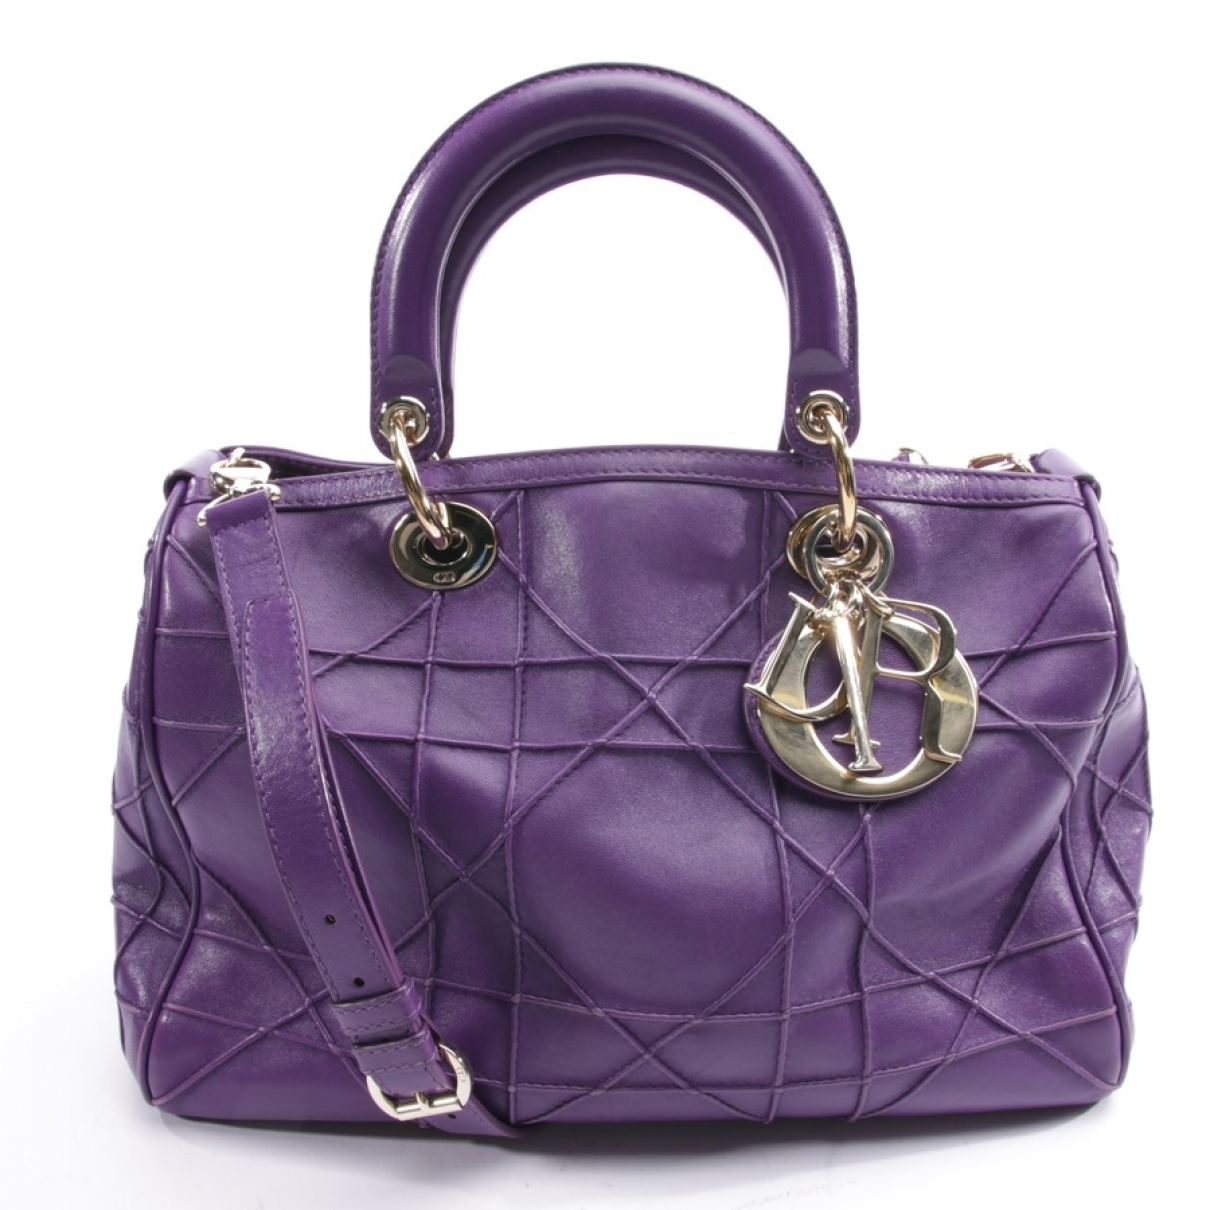 Dior Granville Purple Leather handbag for Women N